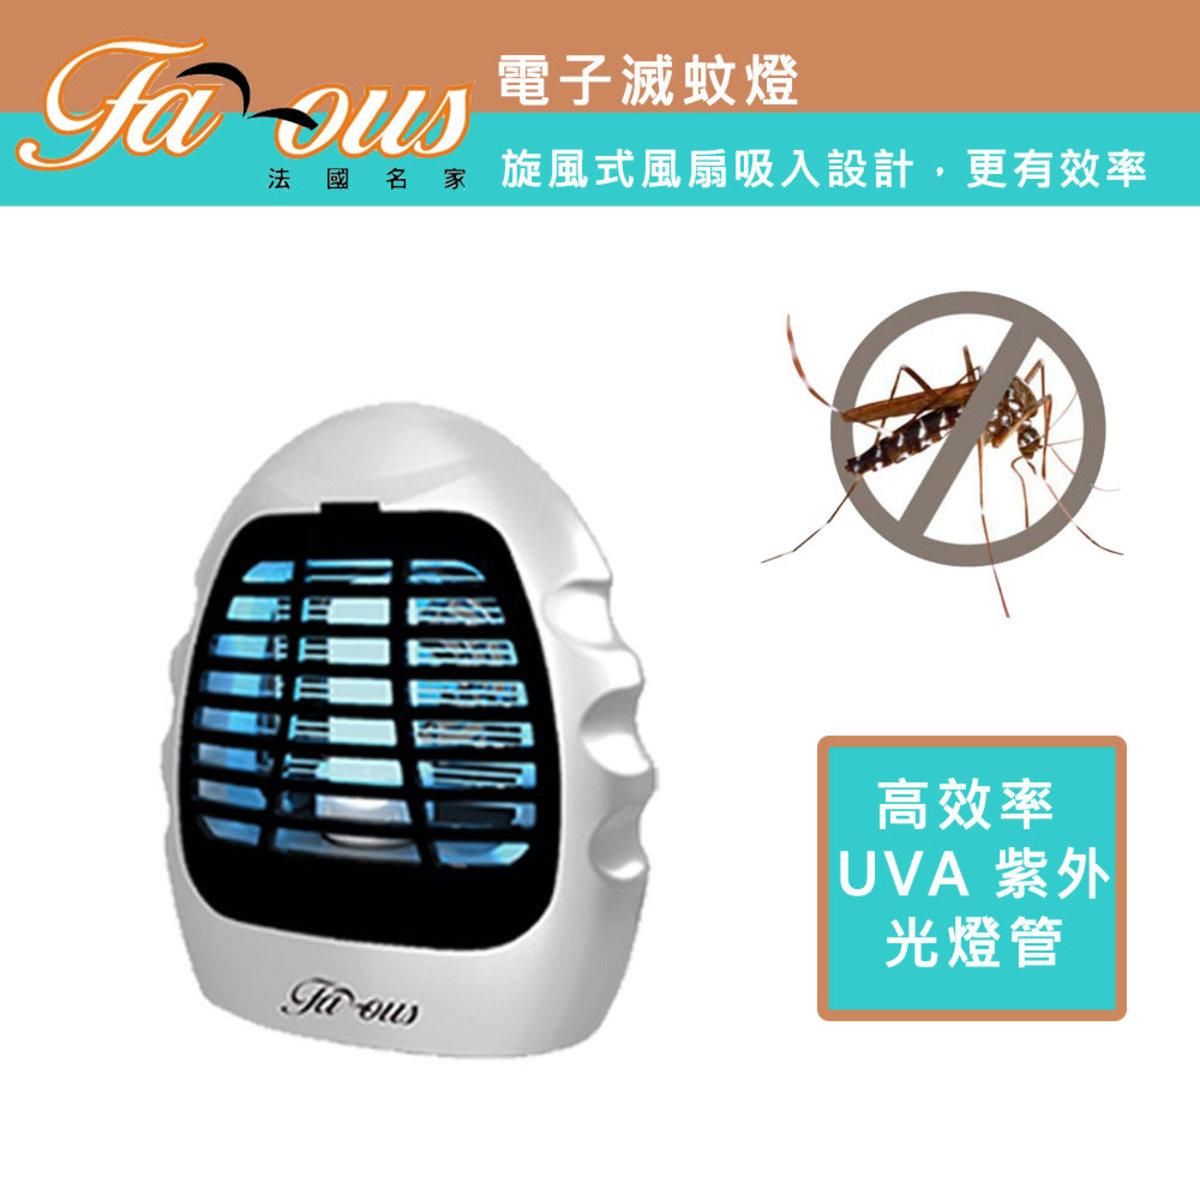 UV insect killer - FIK-14P(FAM)